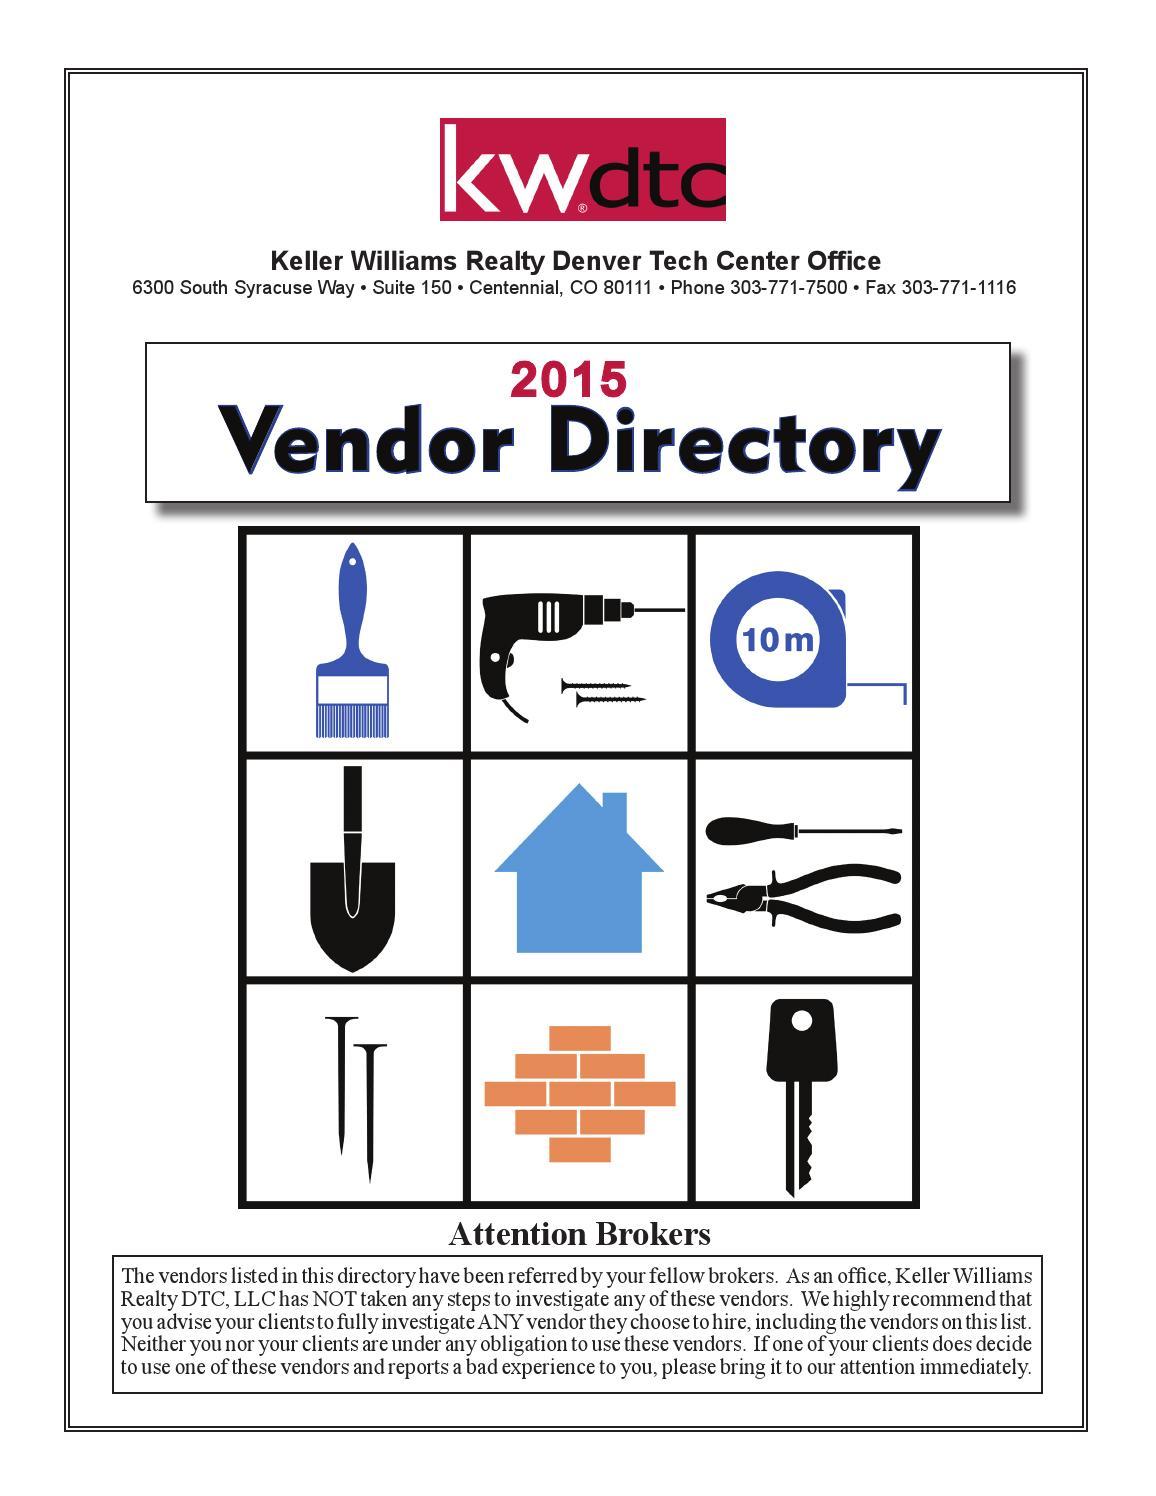 Kw Dtc 2015 Vendor Directory By Keller Williams Denver